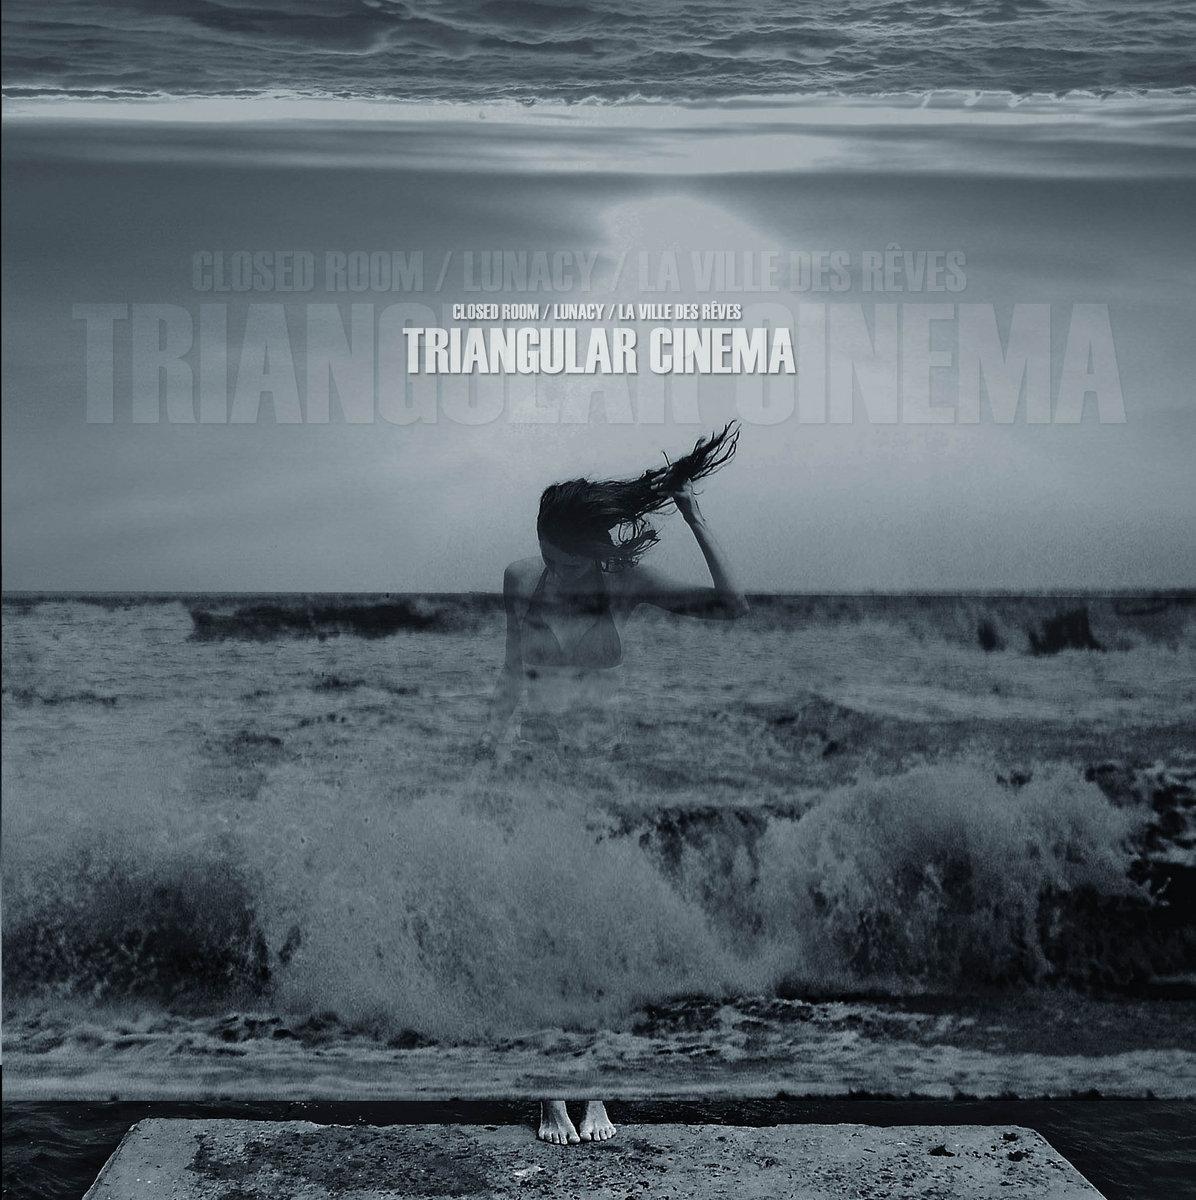 Closed Room/Lunacy/La Ville des Rêves - Triangular Cinema (2014)